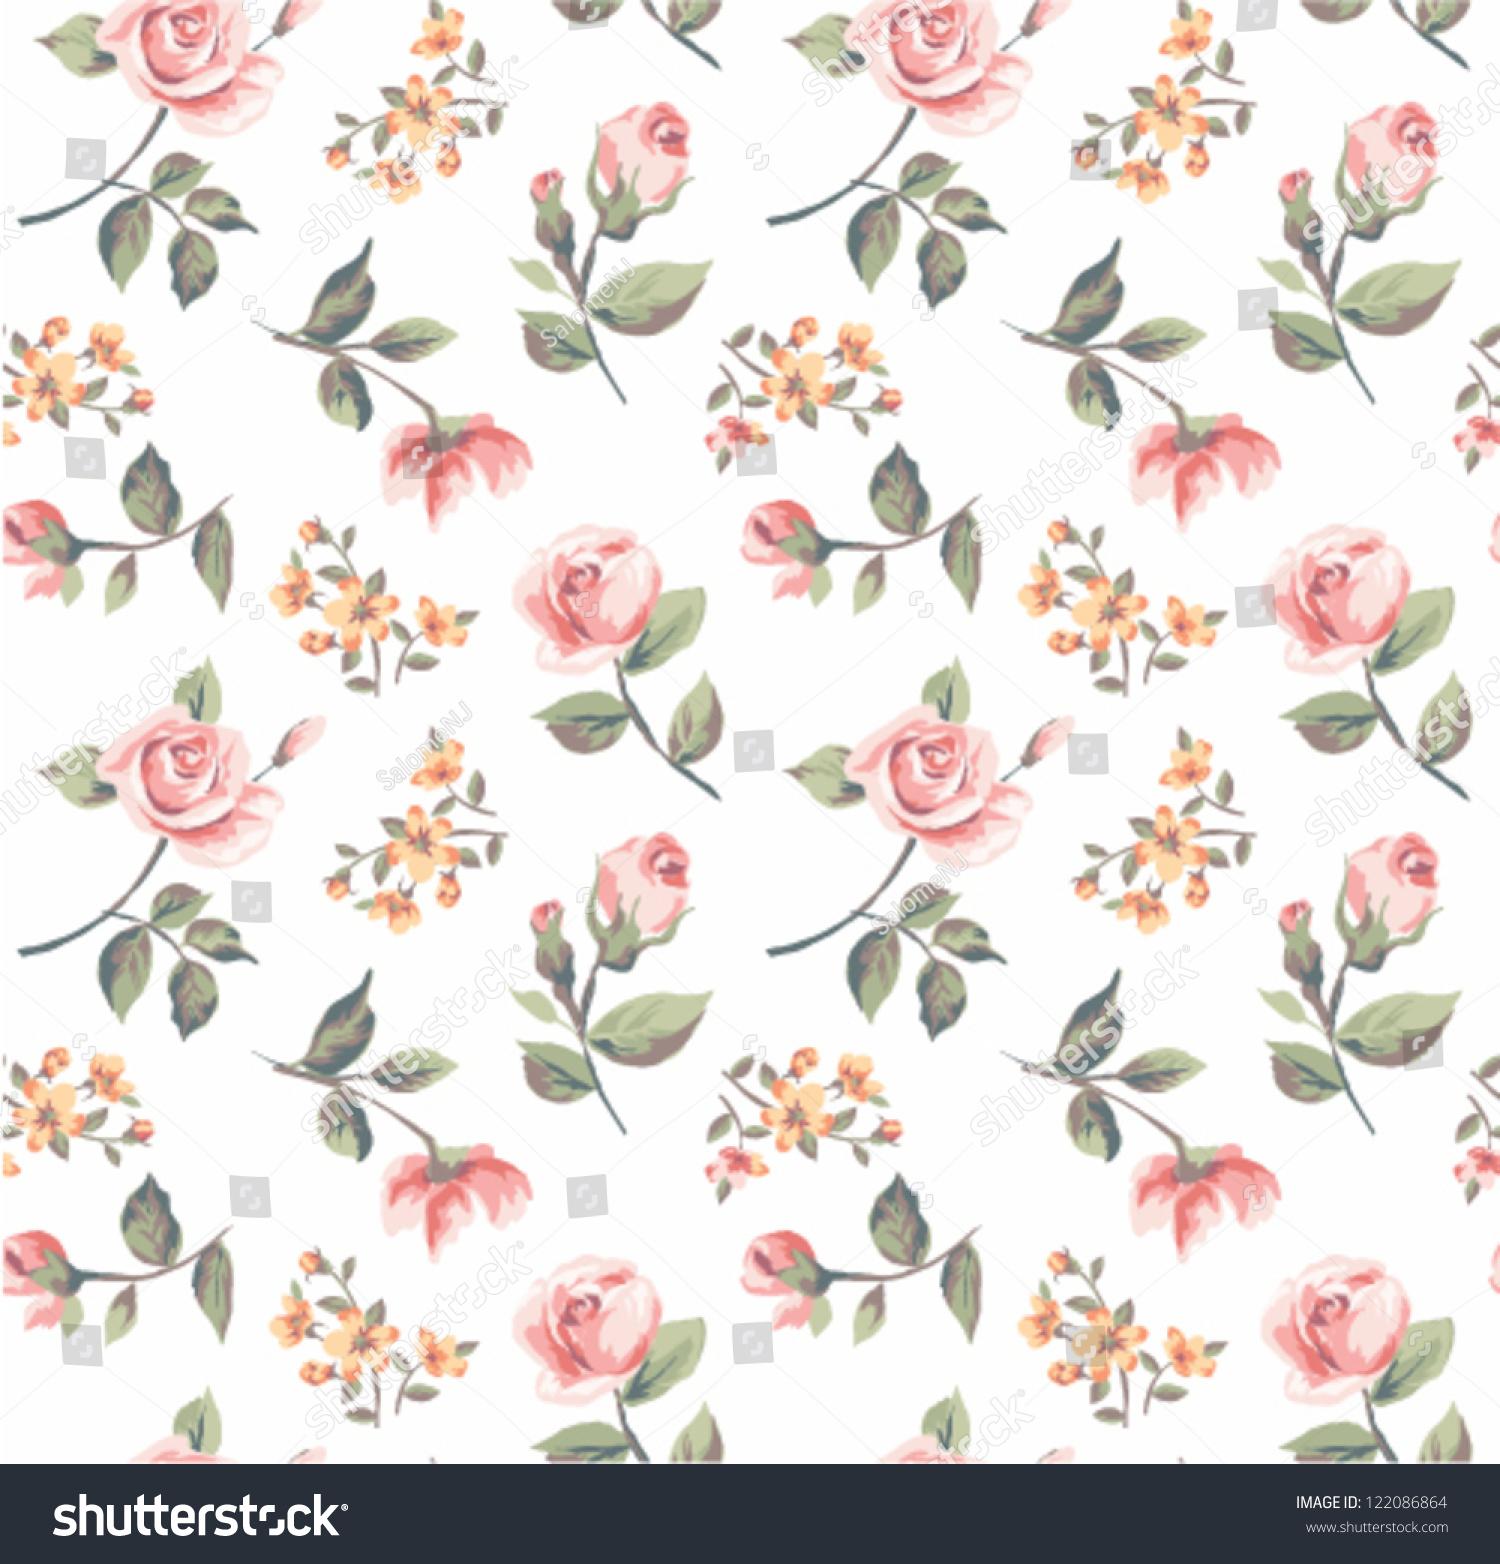 Vintage pastel pattern - photo#30